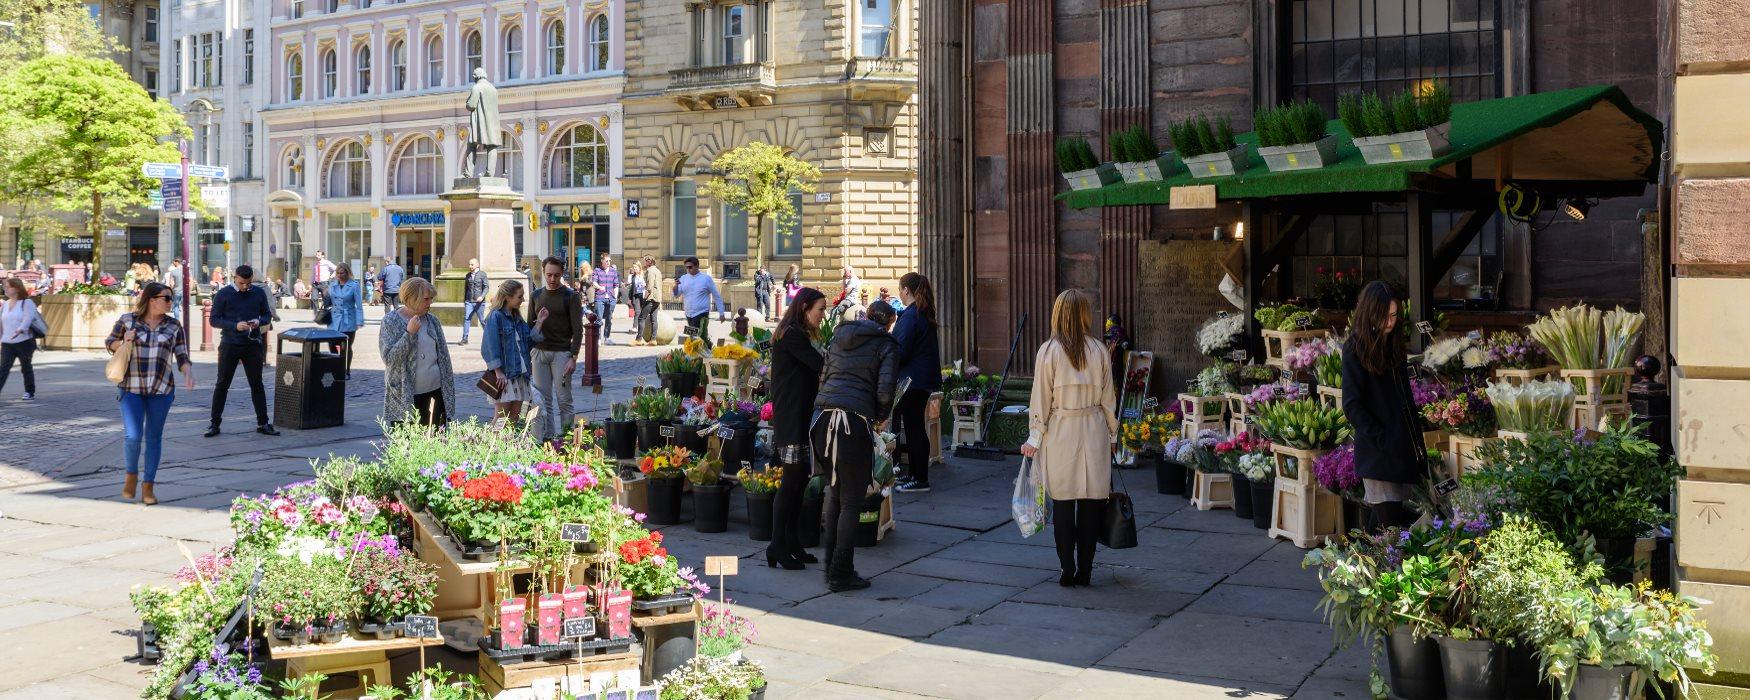 Markets in Manchester